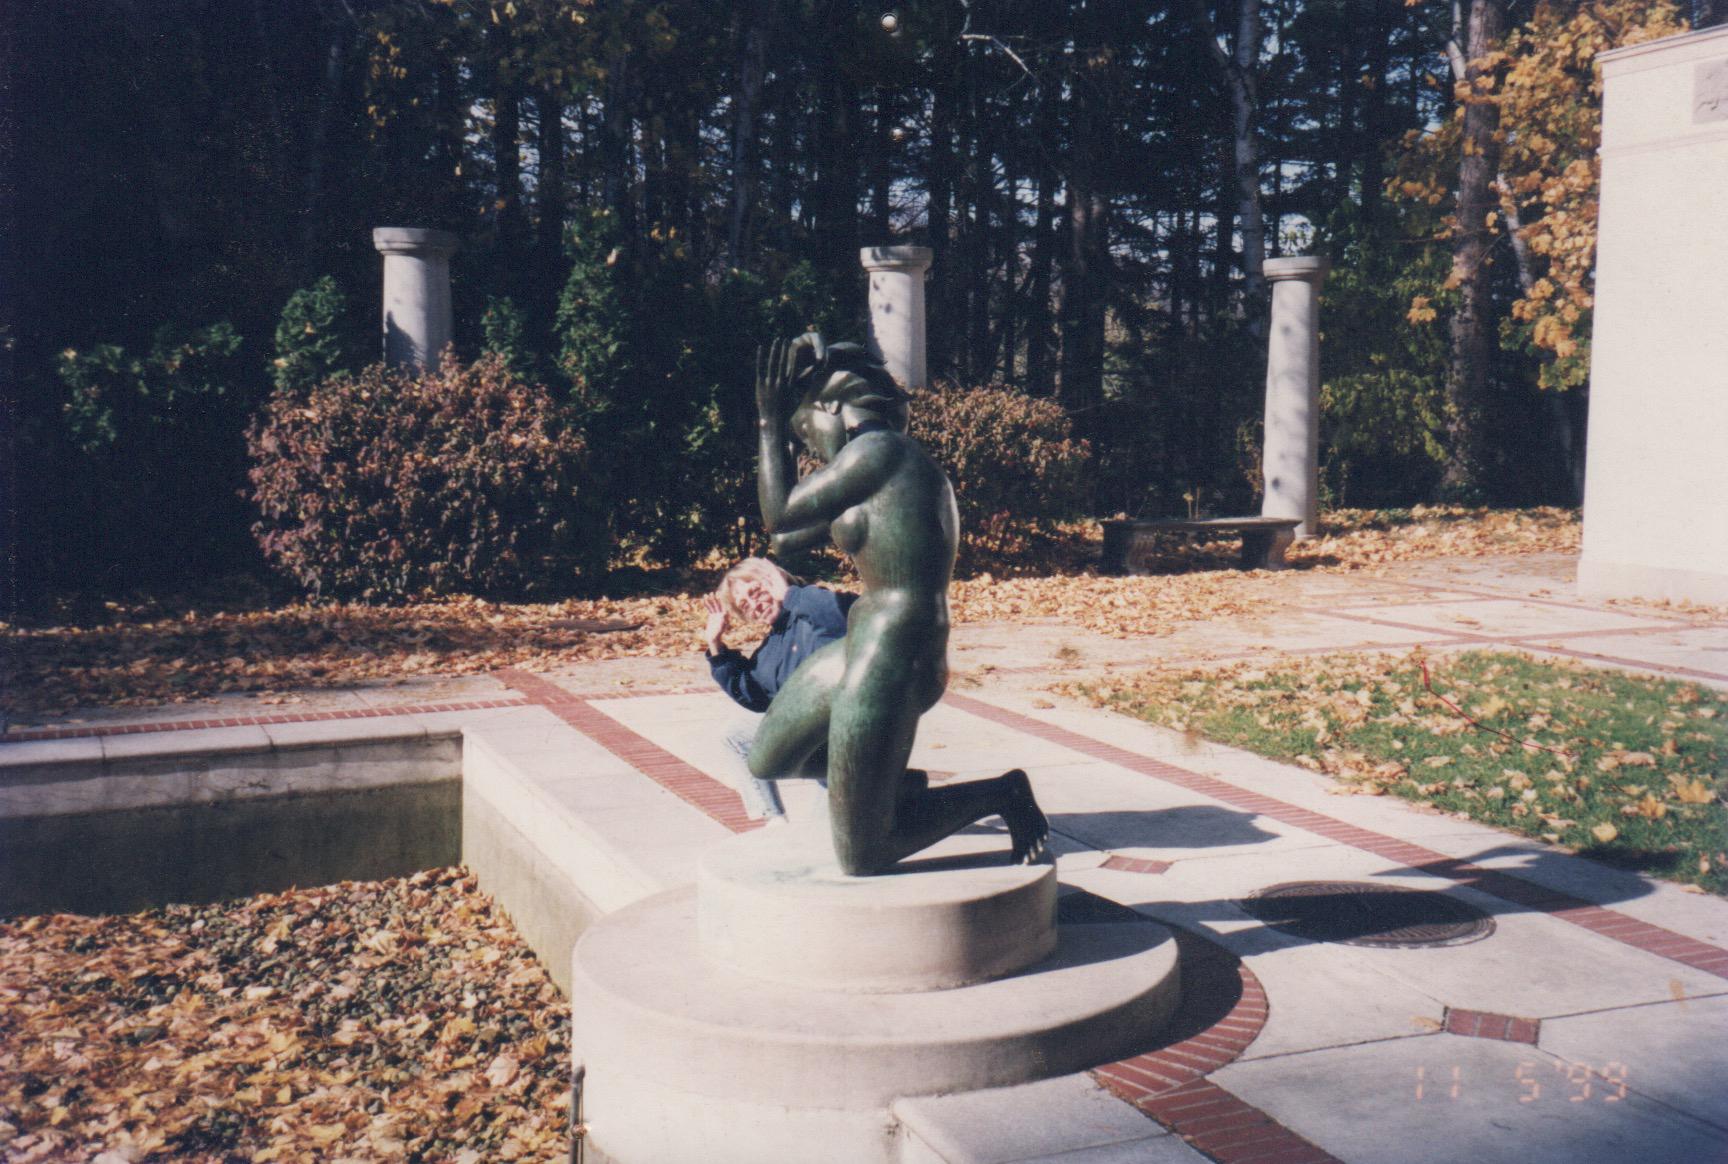 pat and sculpture.jpg